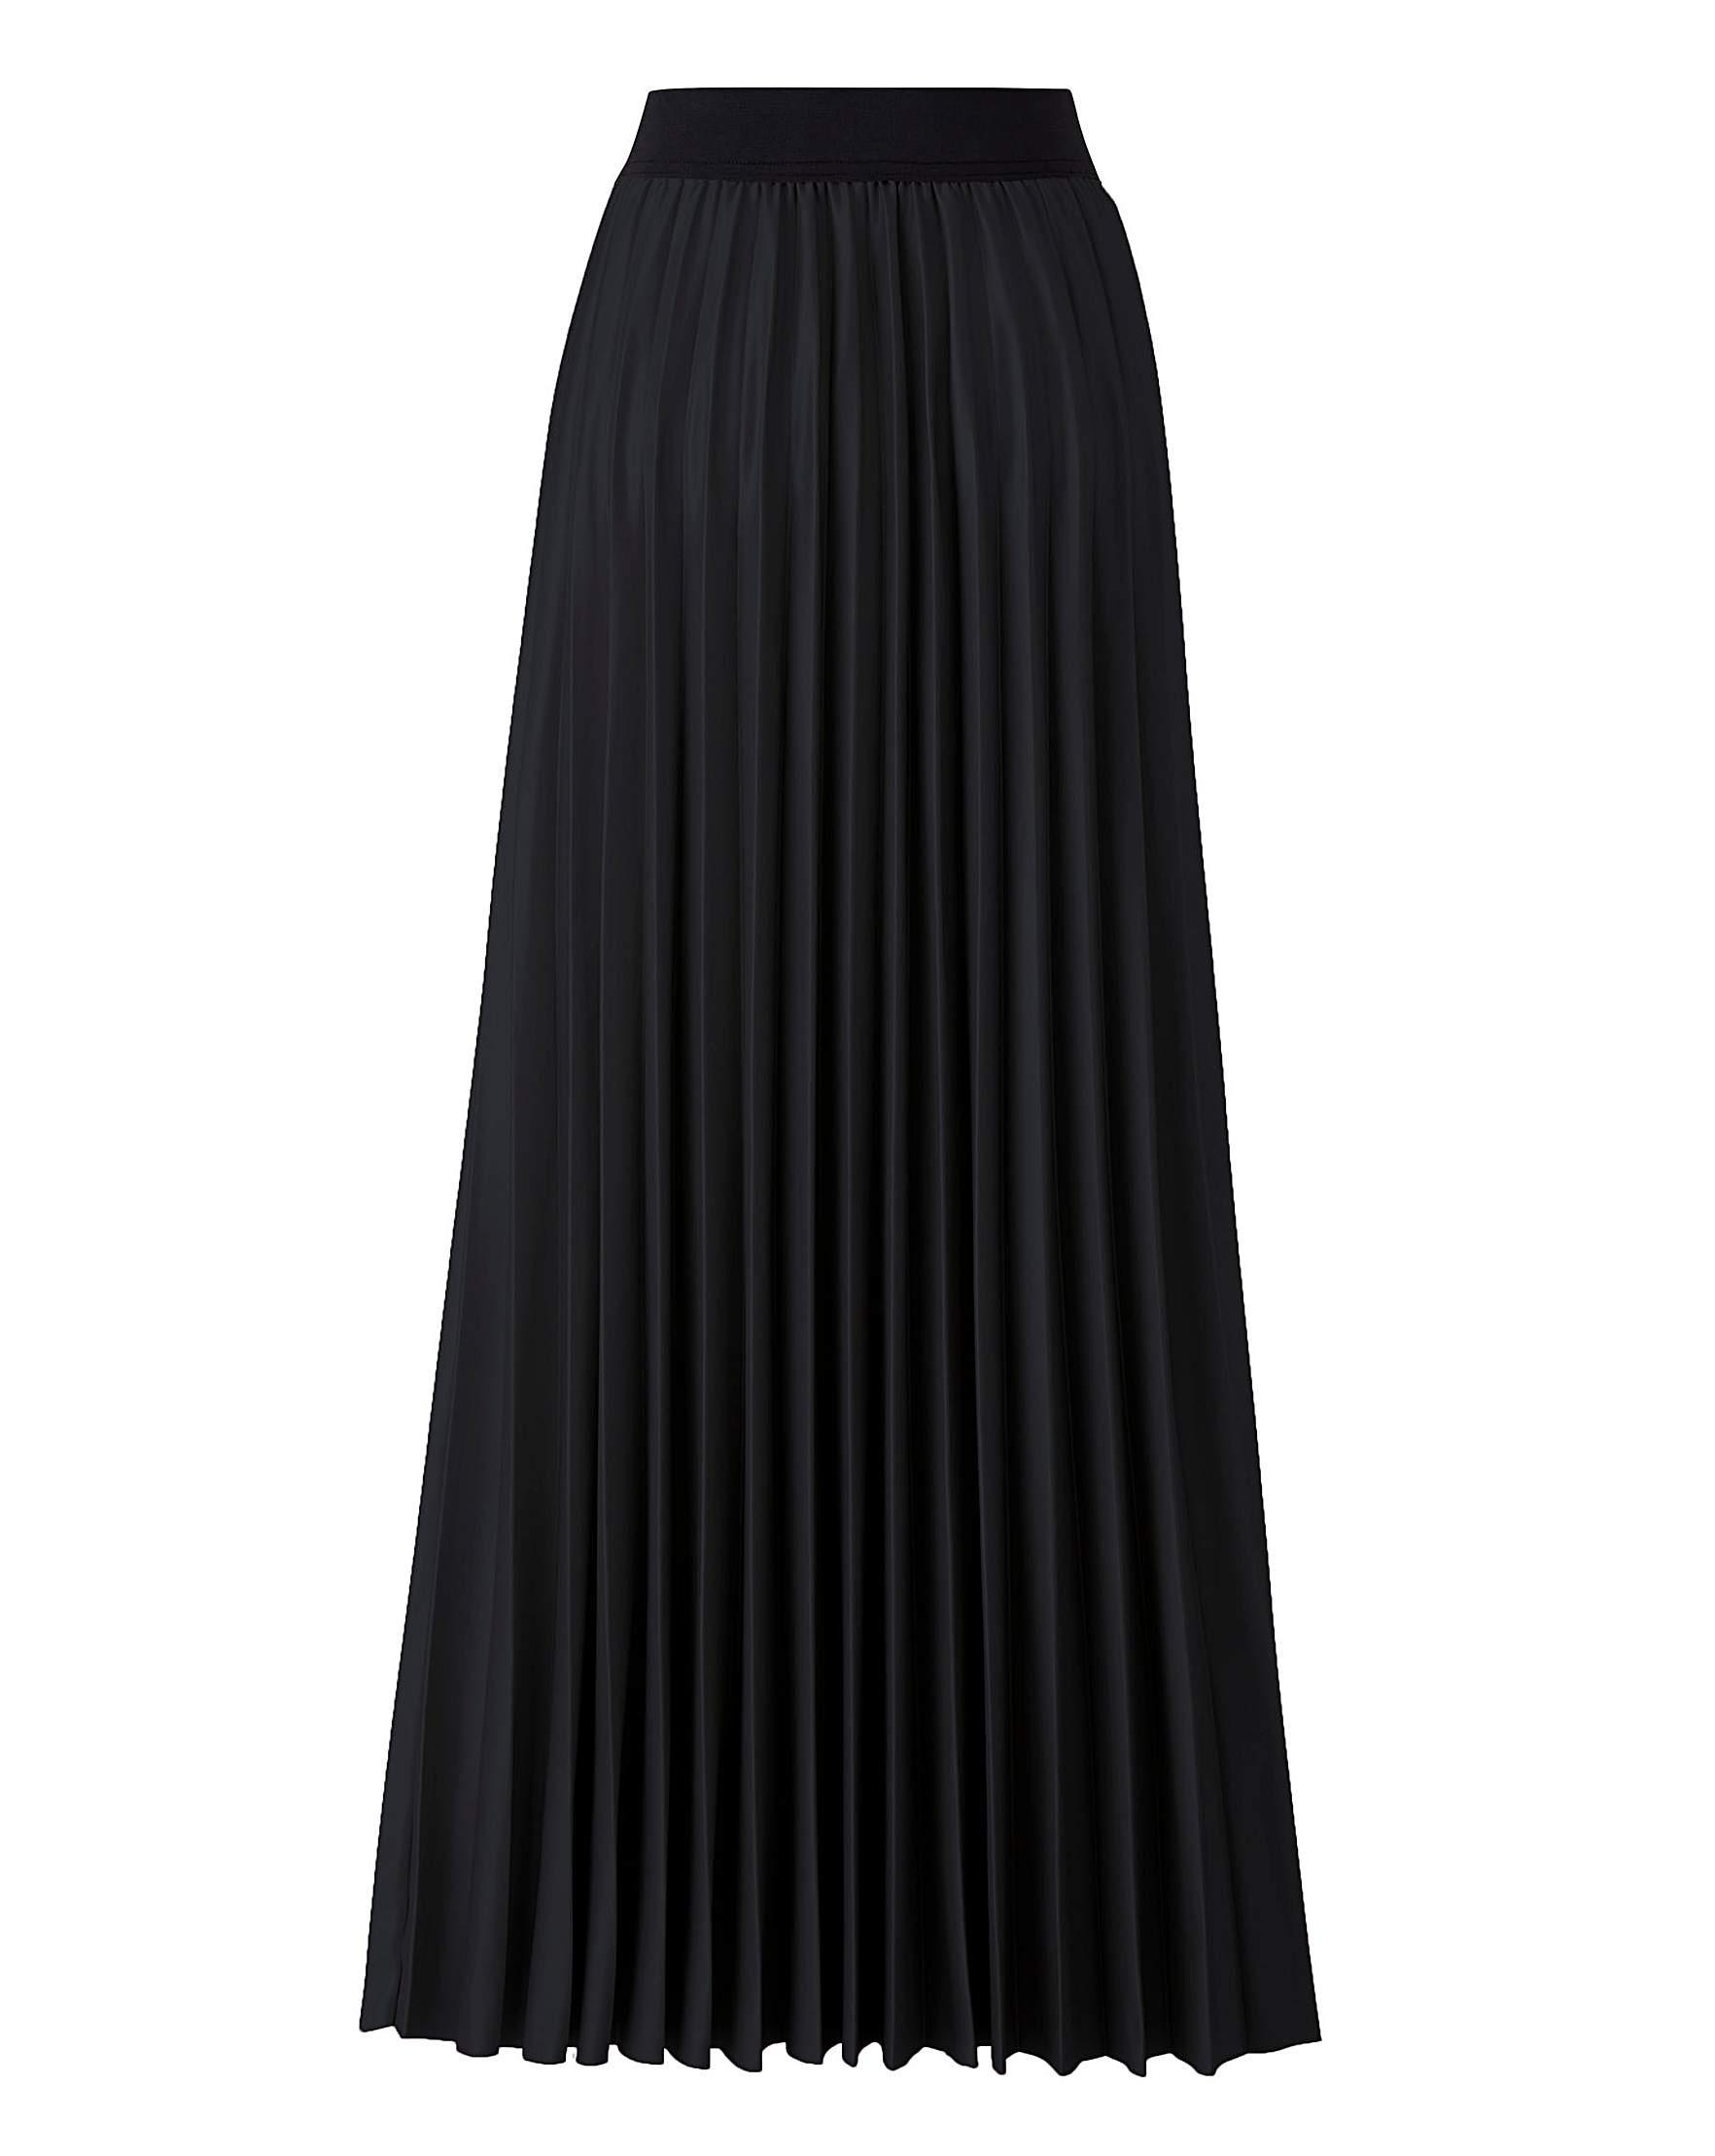 6e8248cbcad Wet Look Sunray Pleat Maxi Skirt